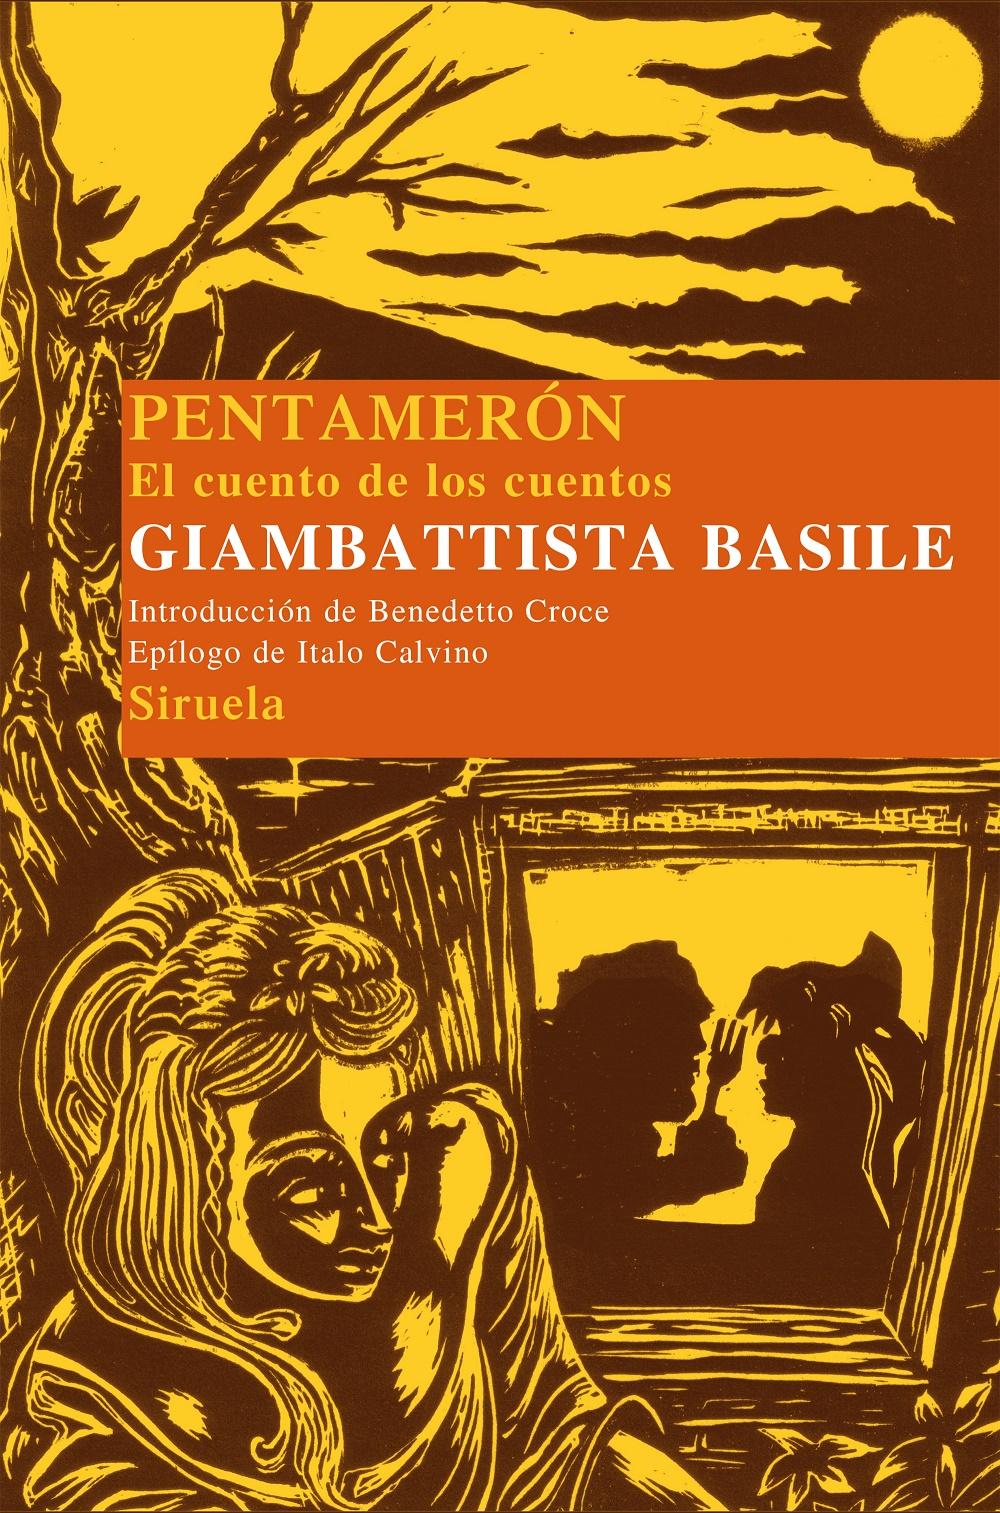 https://laantiguabiblos.blogspot.com.es/2017/02/pentameron-giambattista-basile.html